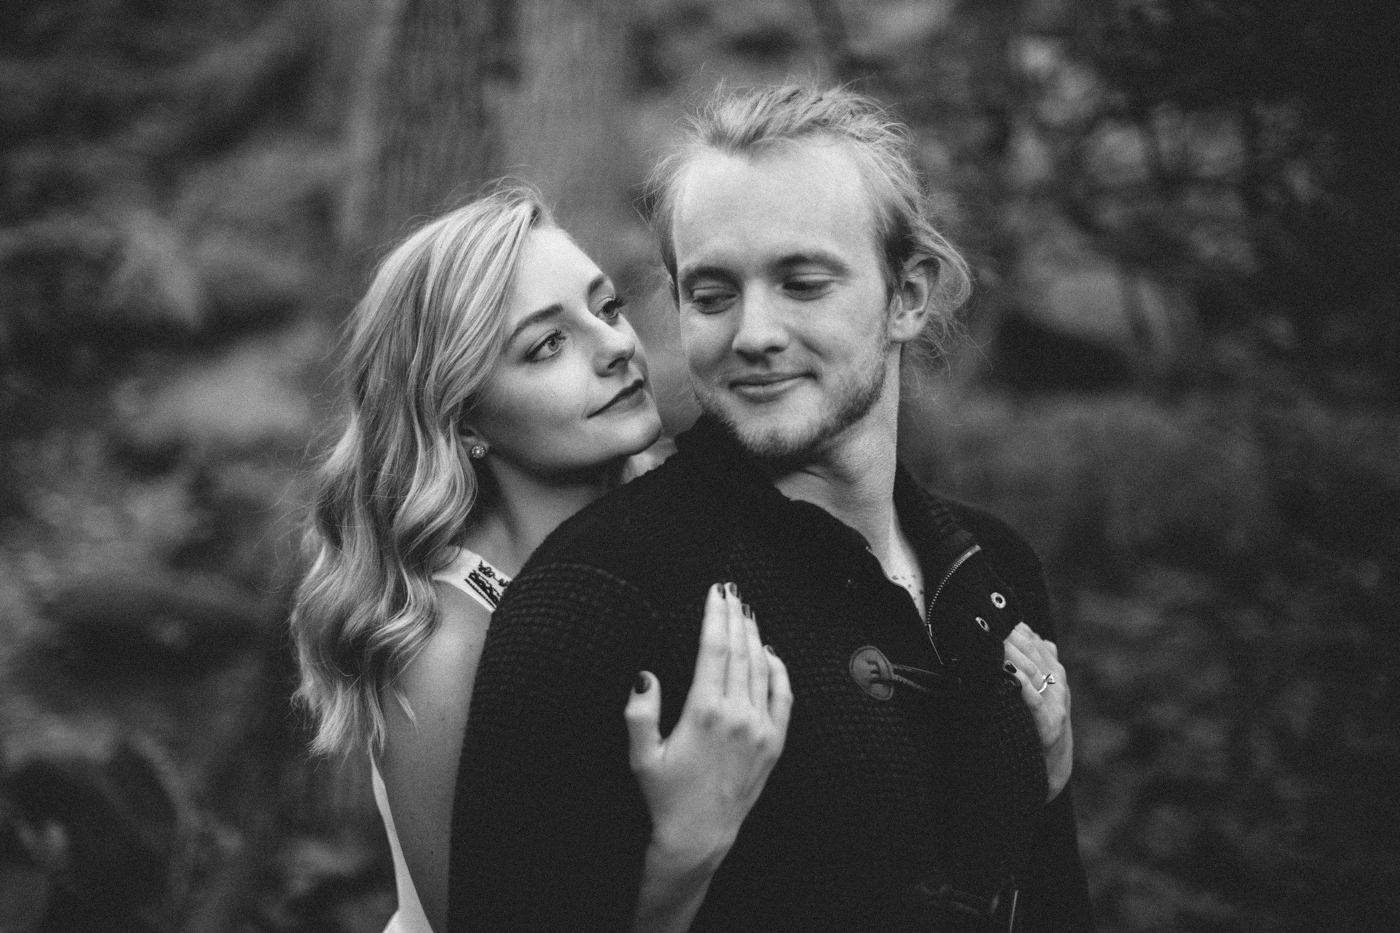 Sioux_Falls_Des_Moines_Engagement_Wedding_Photographer_13.jpg